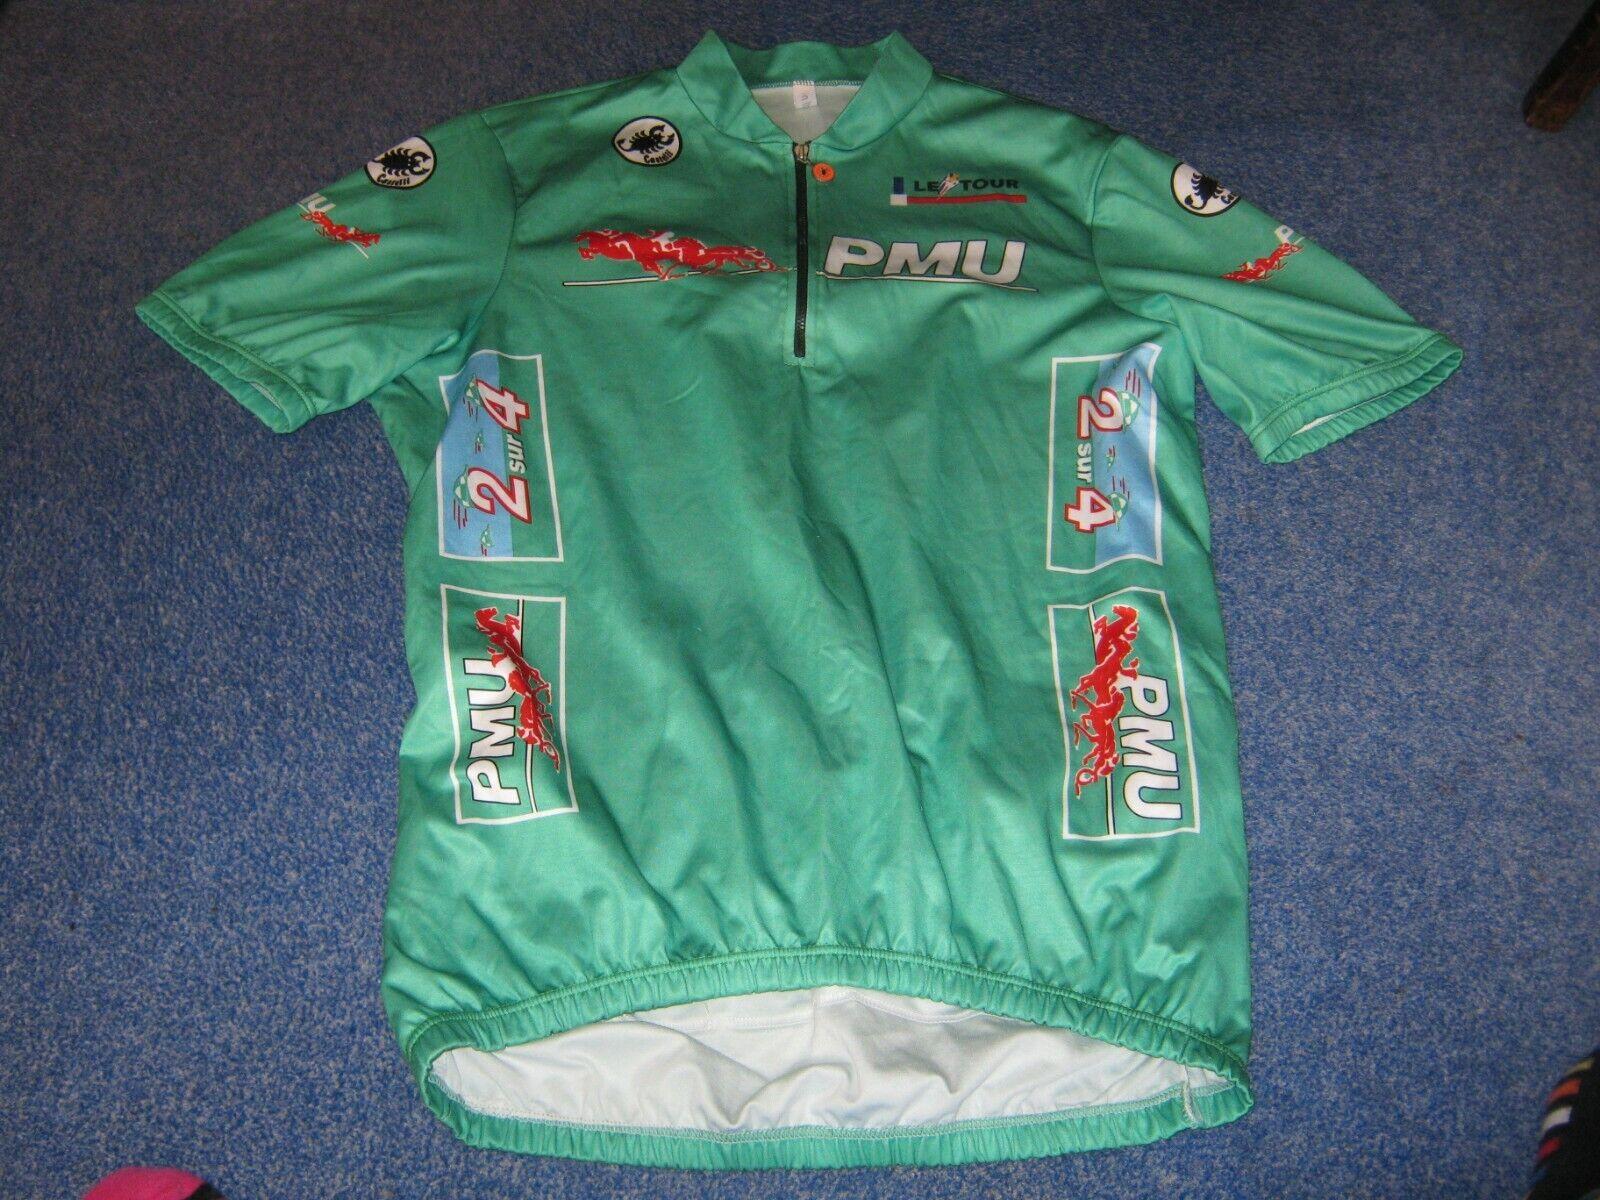 Tour de France 1991 - Castelli Grün Points Leader Italian cycling jersey